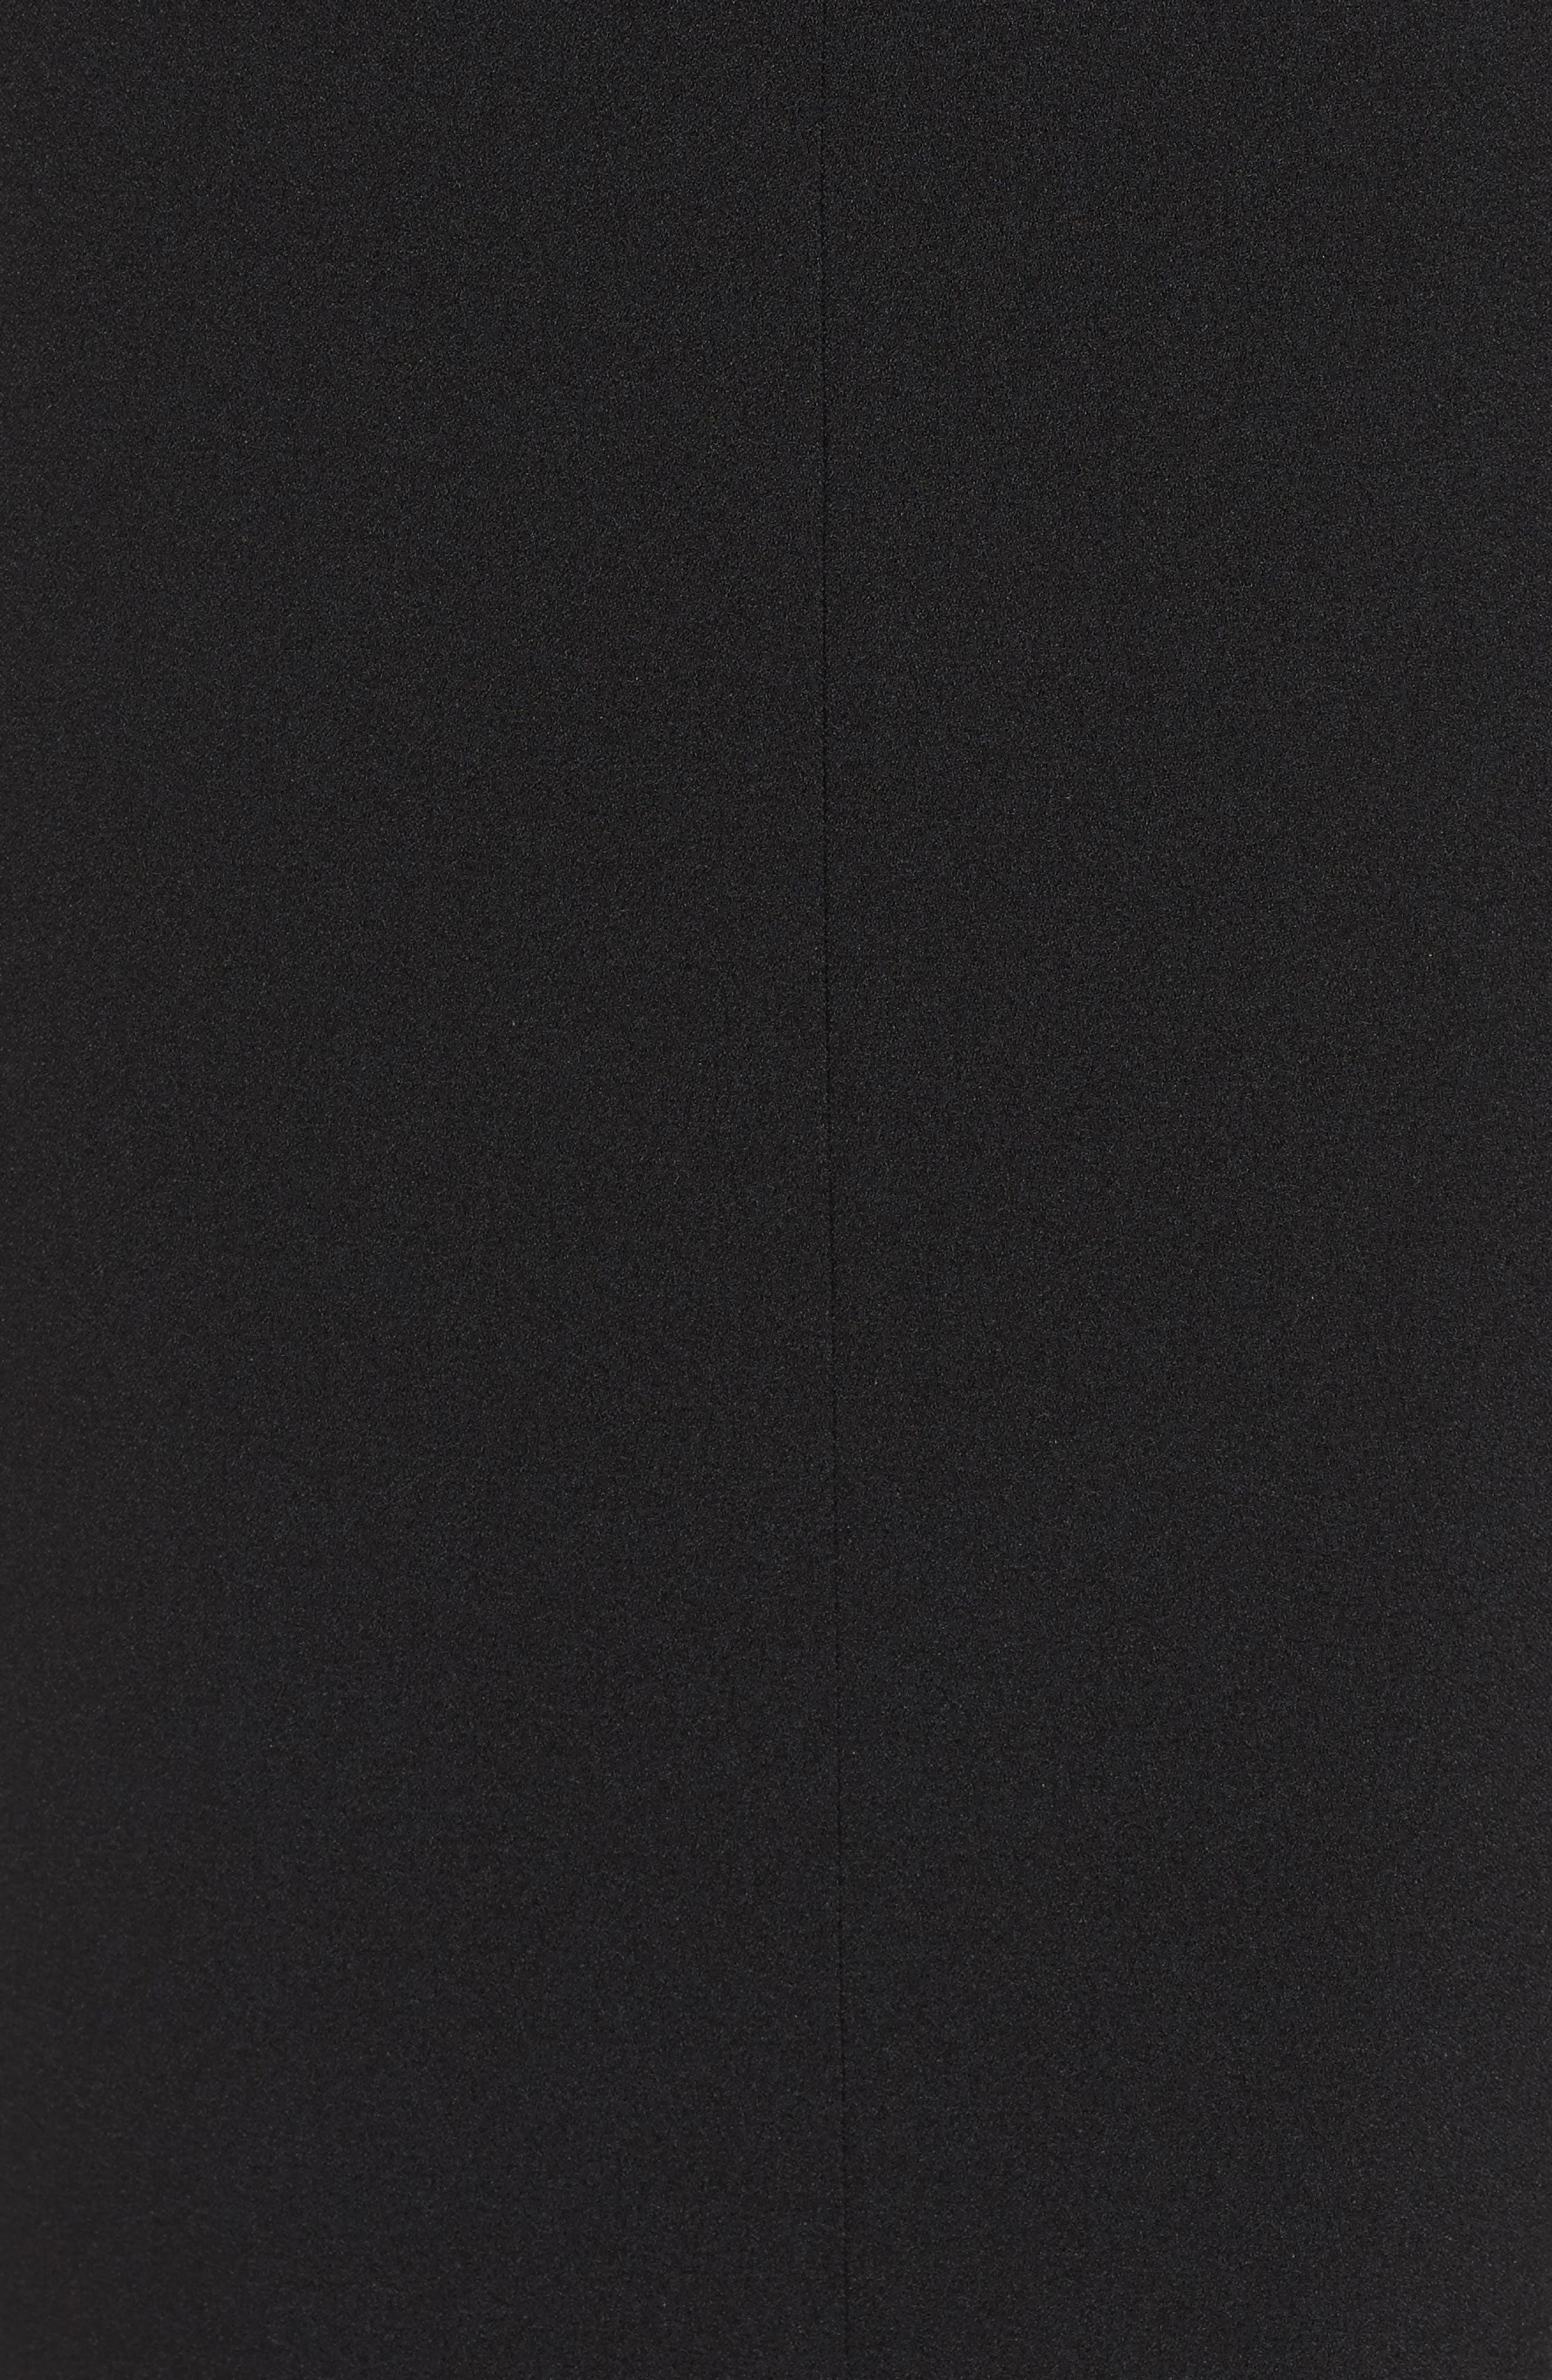 Ruffle Sleeve Sheath Dress,                             Alternate thumbnail 7, color,                             Black